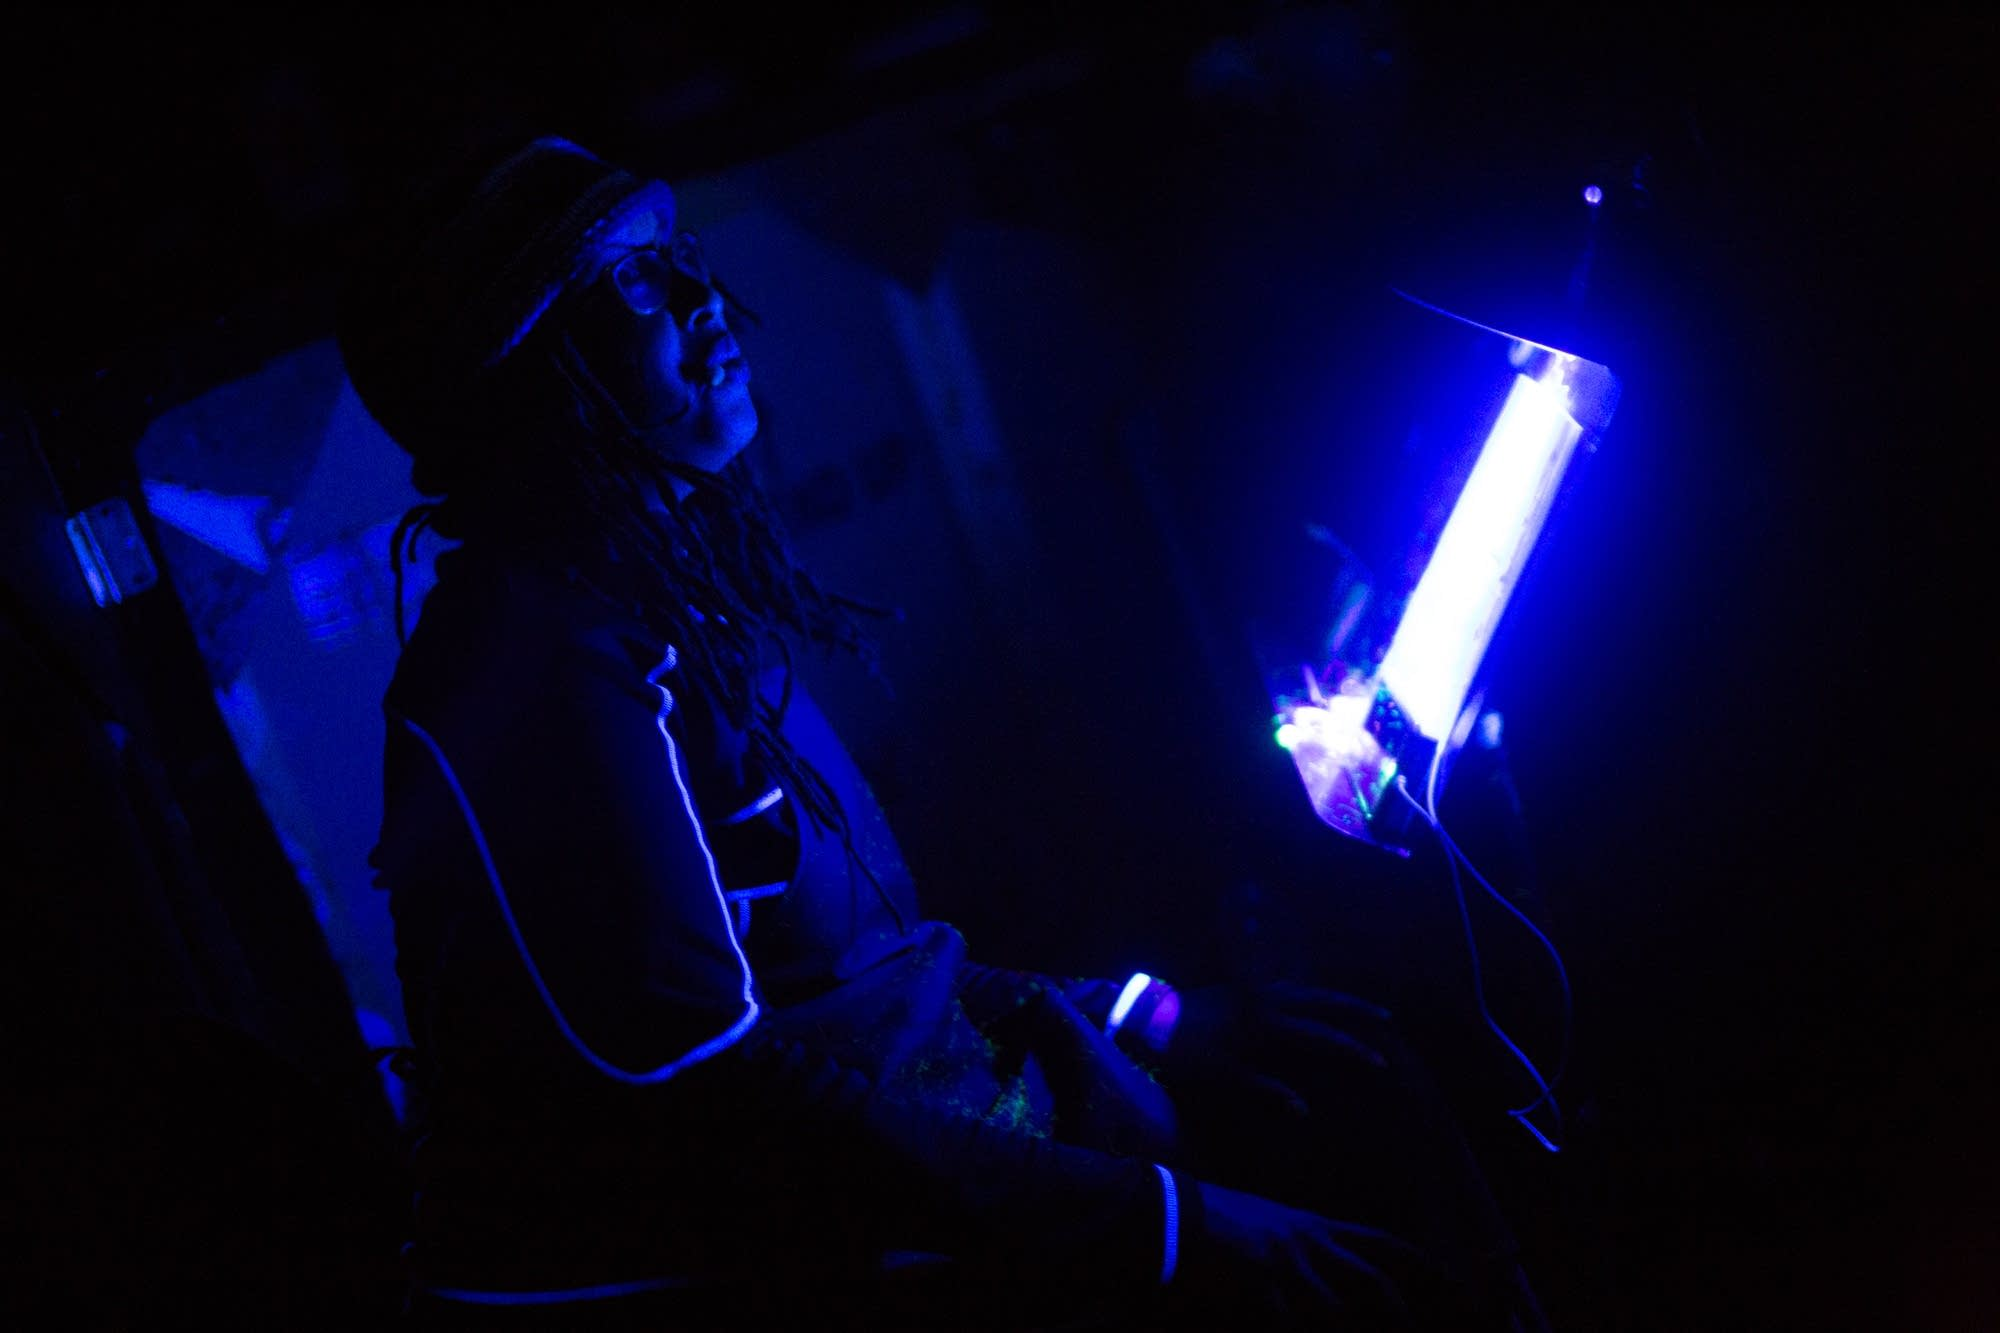 Mankwe Ndosi reads off a script lit by blacklight.